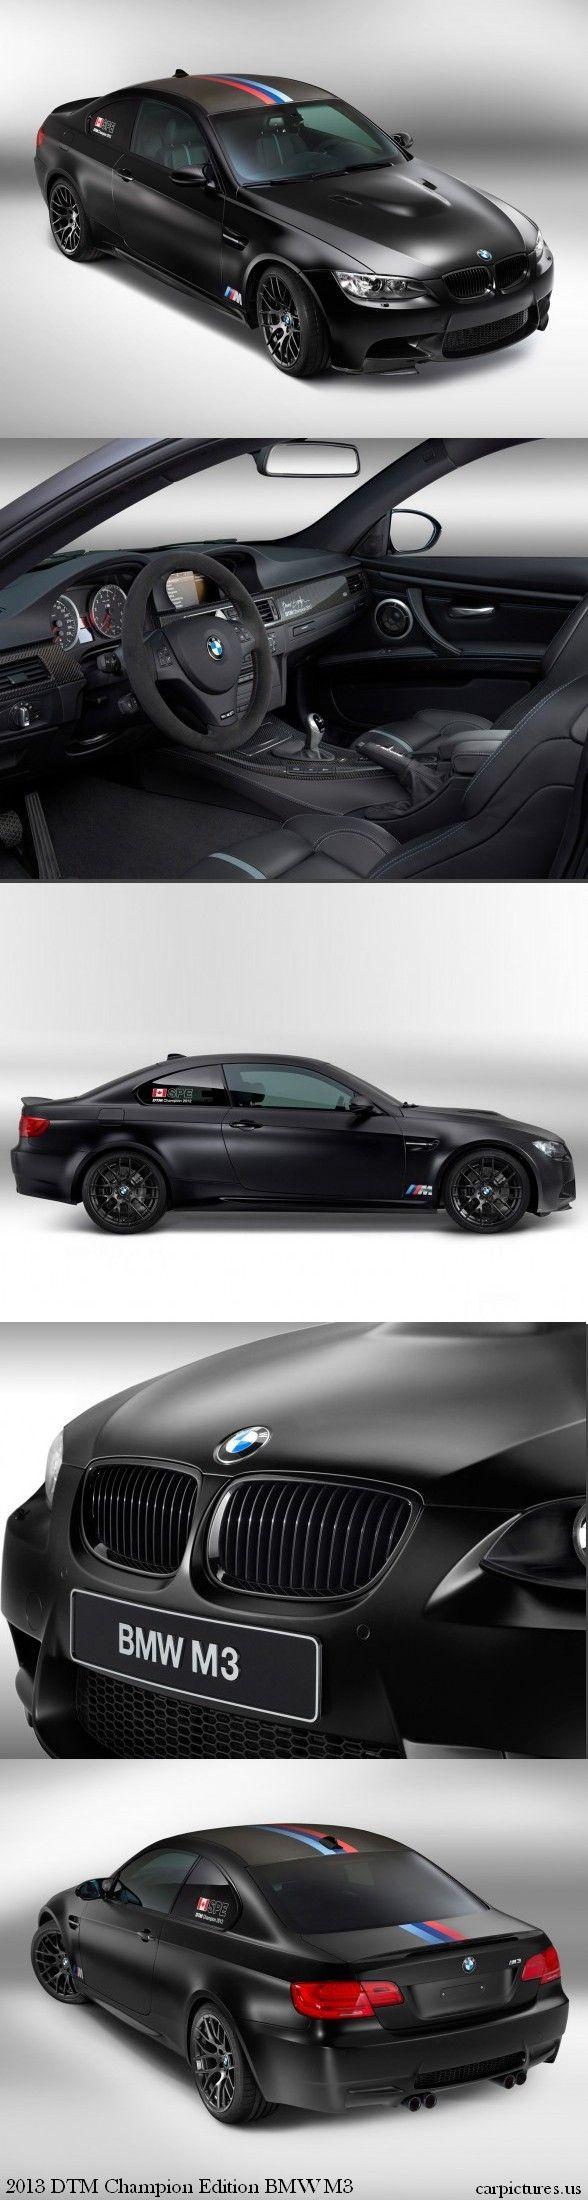 les 64 meilleures images du tableau bmw sur pinterest voitures v hicules et belles voitures. Black Bedroom Furniture Sets. Home Design Ideas